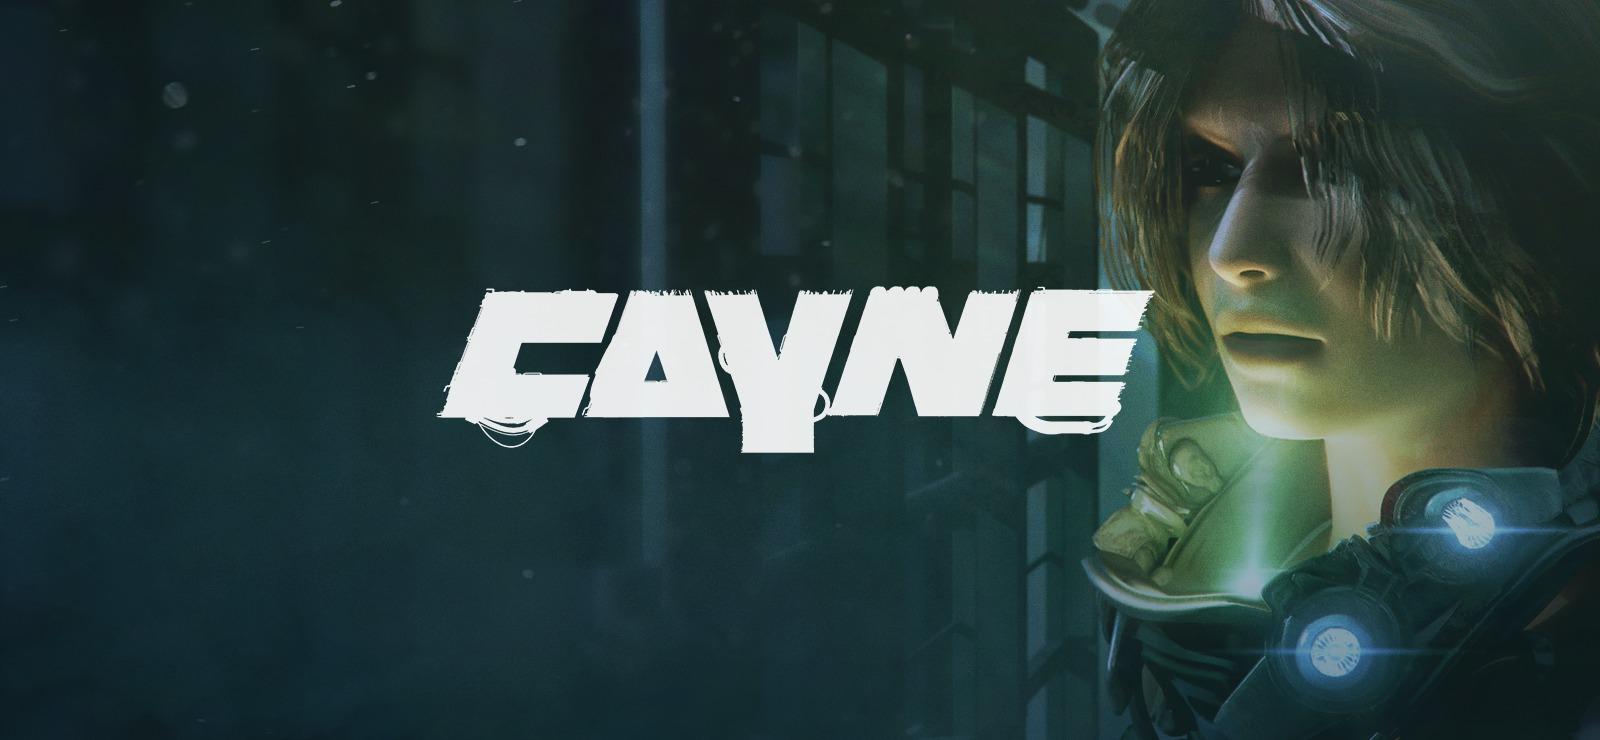 cayne game